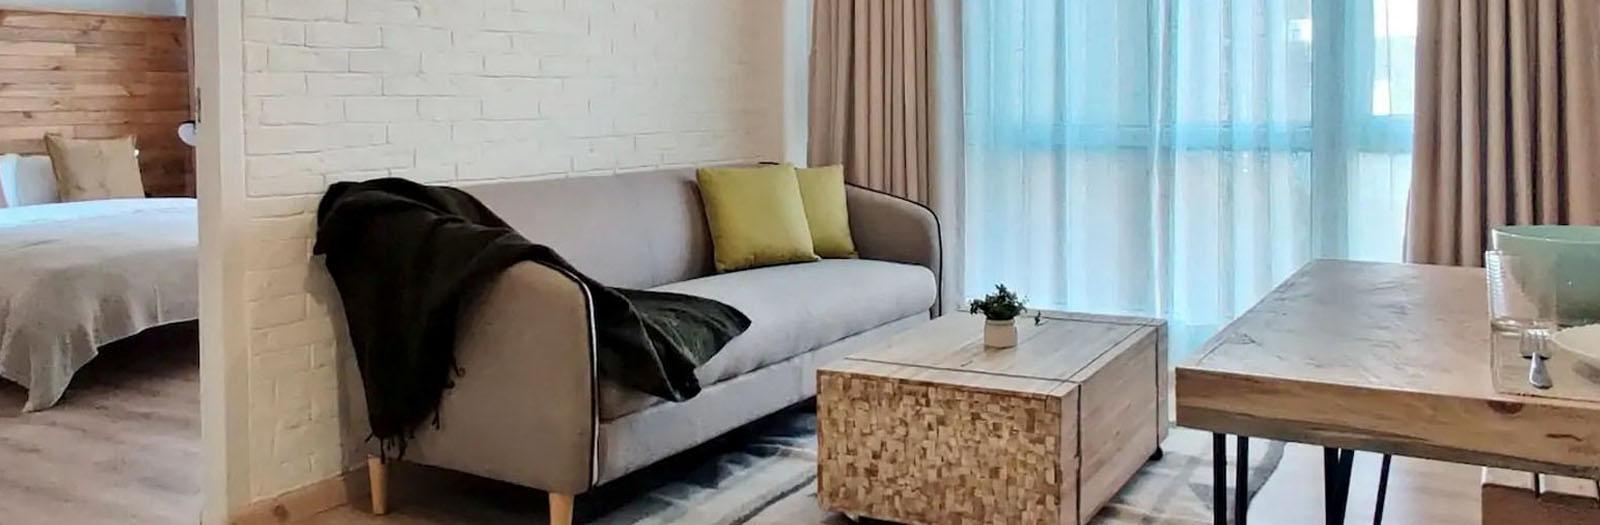 City Crib 1BR Apartment